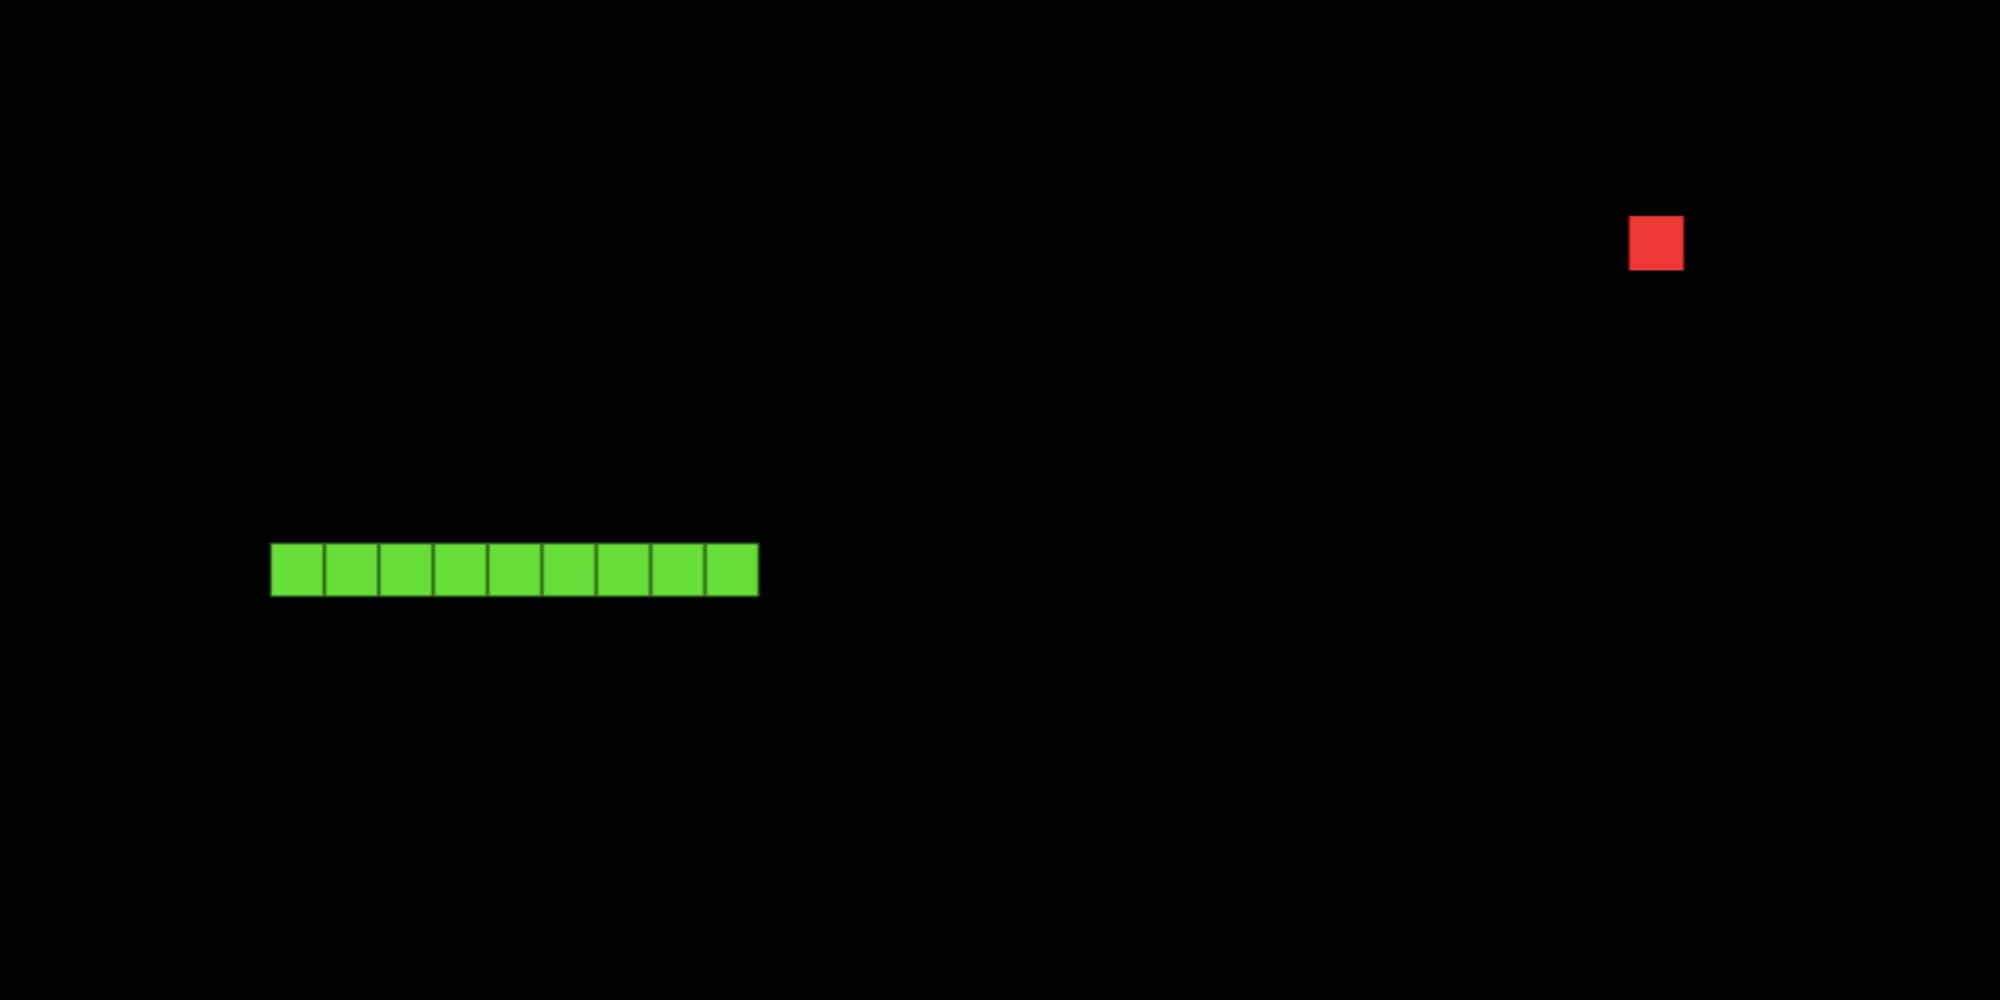 cool math games snake